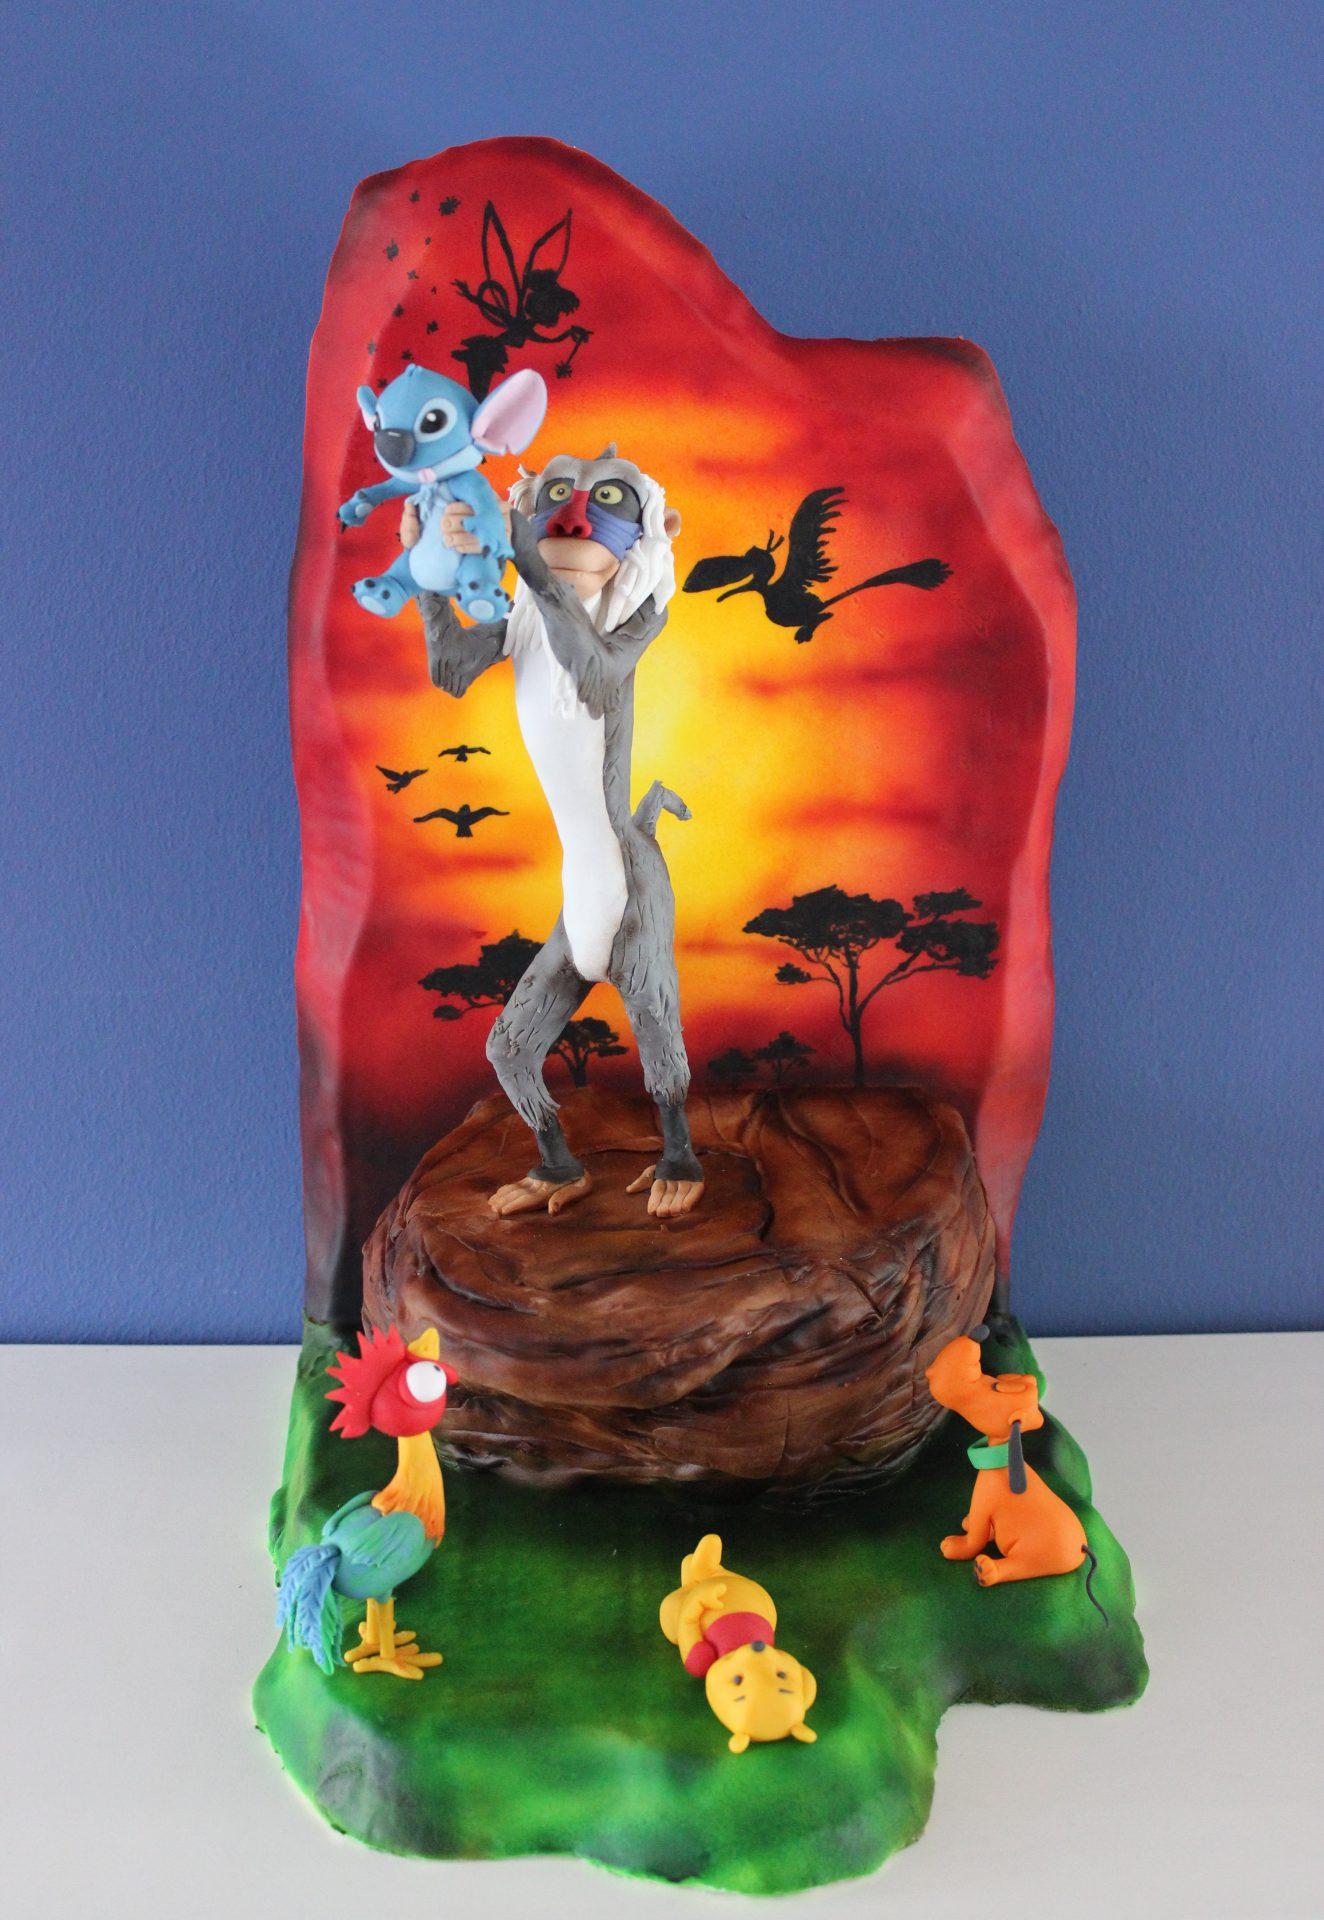 Wendy S Cake Art Facebook : Disney Deviant Sugar Art Collaboration Cake Masters Magazine